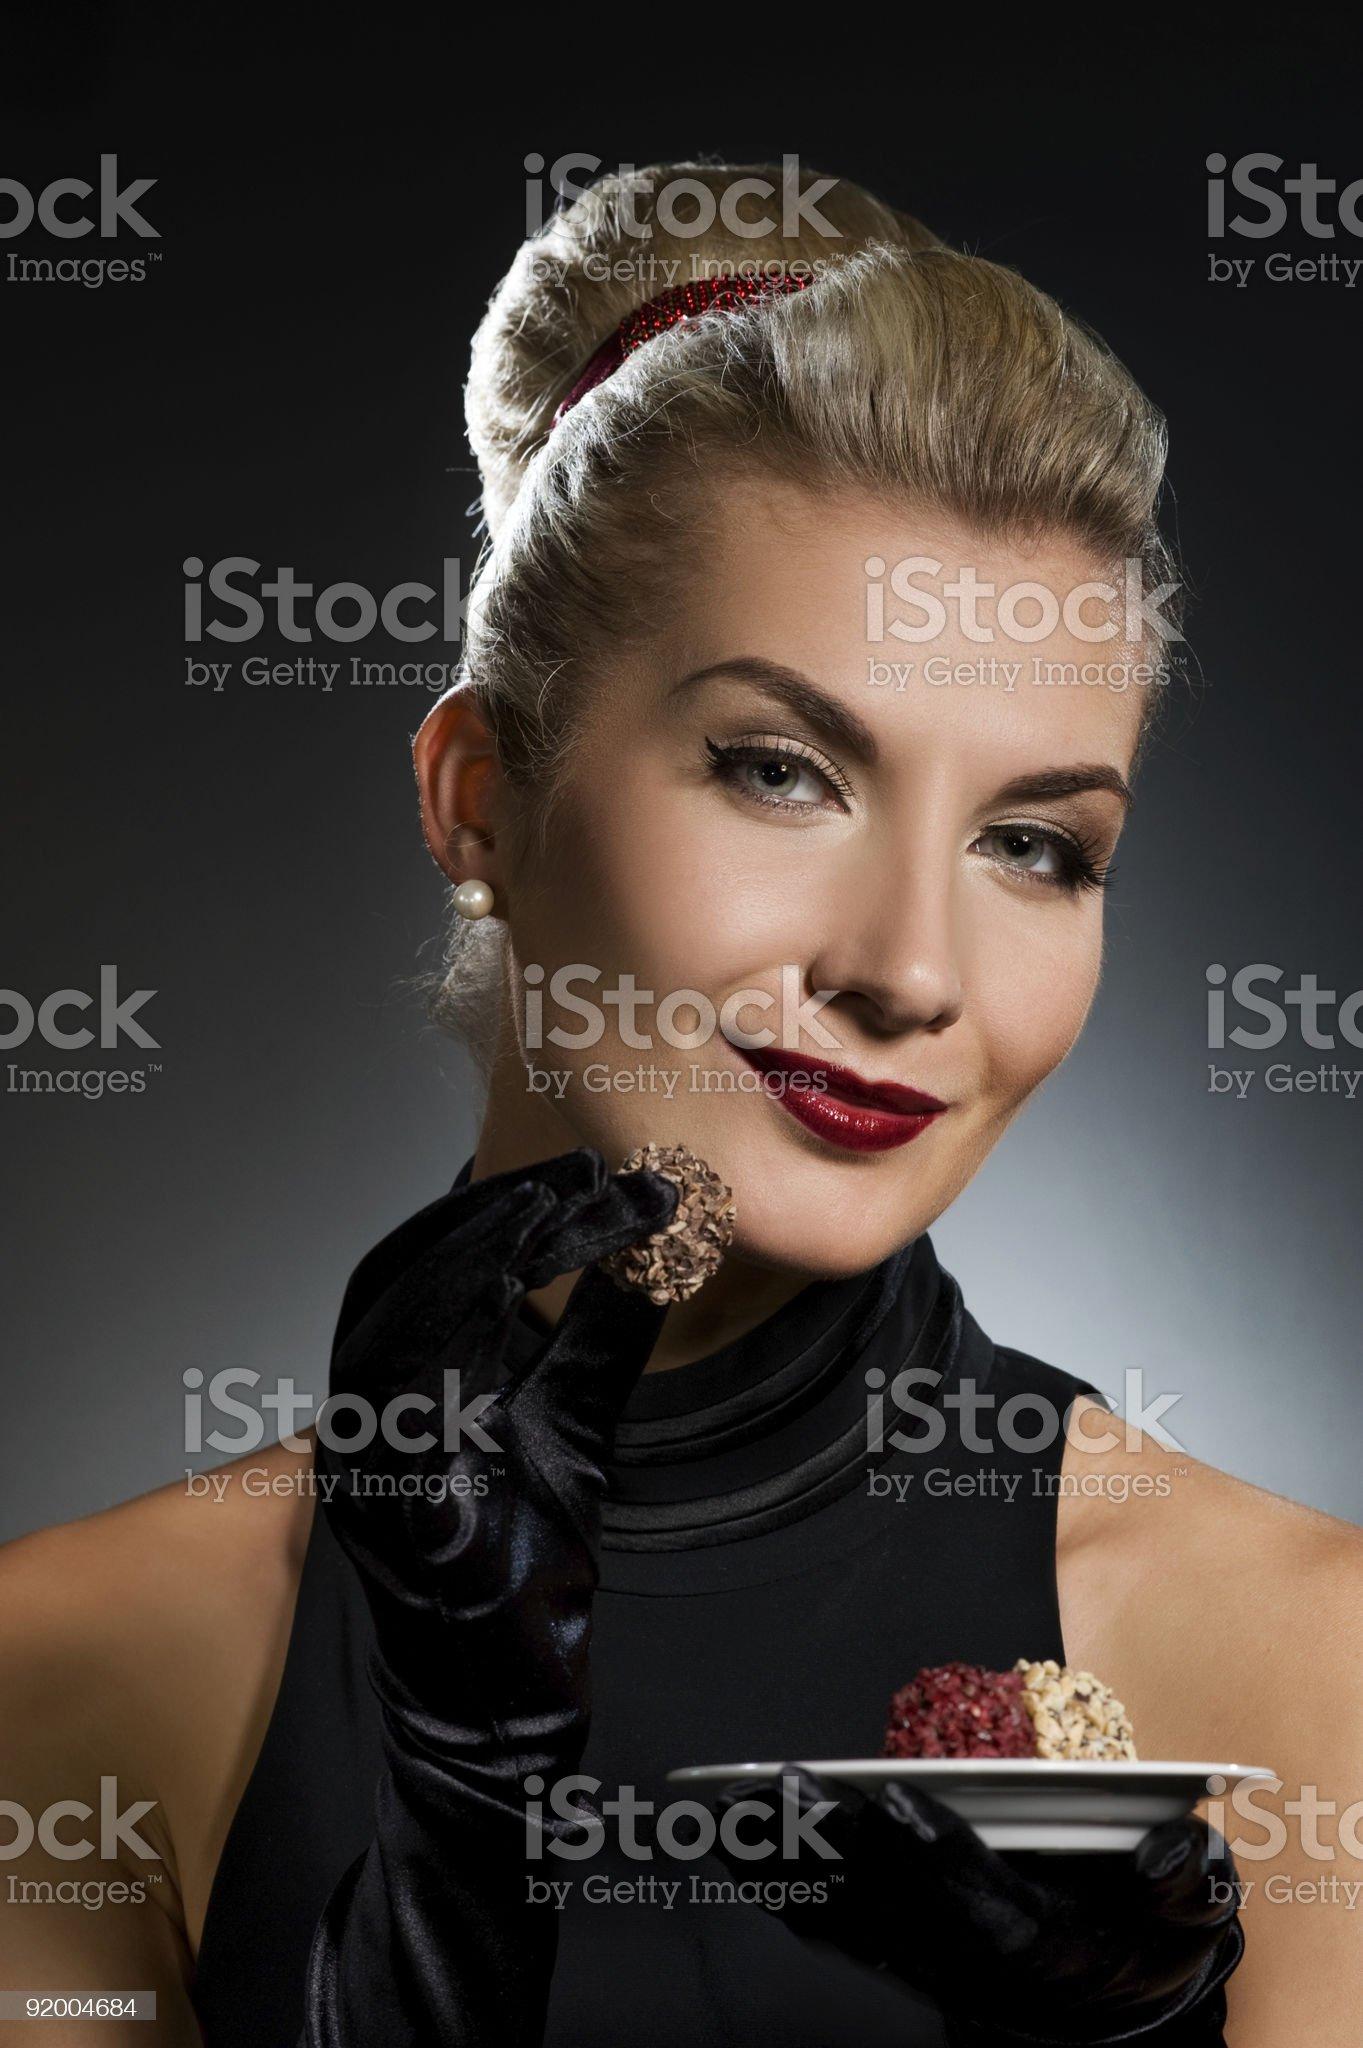 Charming lady tasting chocolate royalty-free stock photo